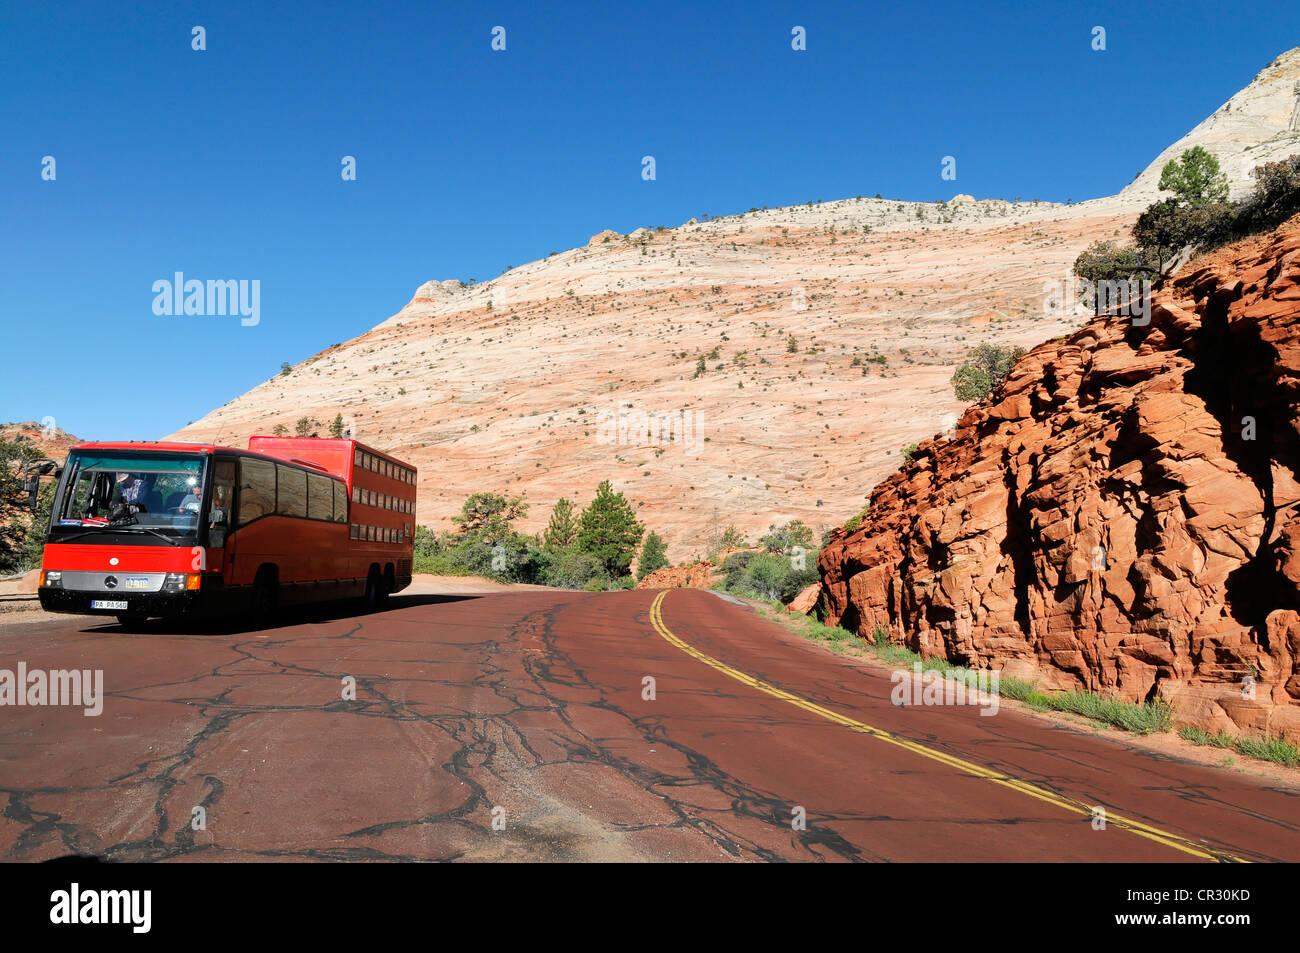 Rotel Coach Rolling Hotel Near Checkerboard Mesa Sandstone Rock Formations Zion National Park Utah USA North America